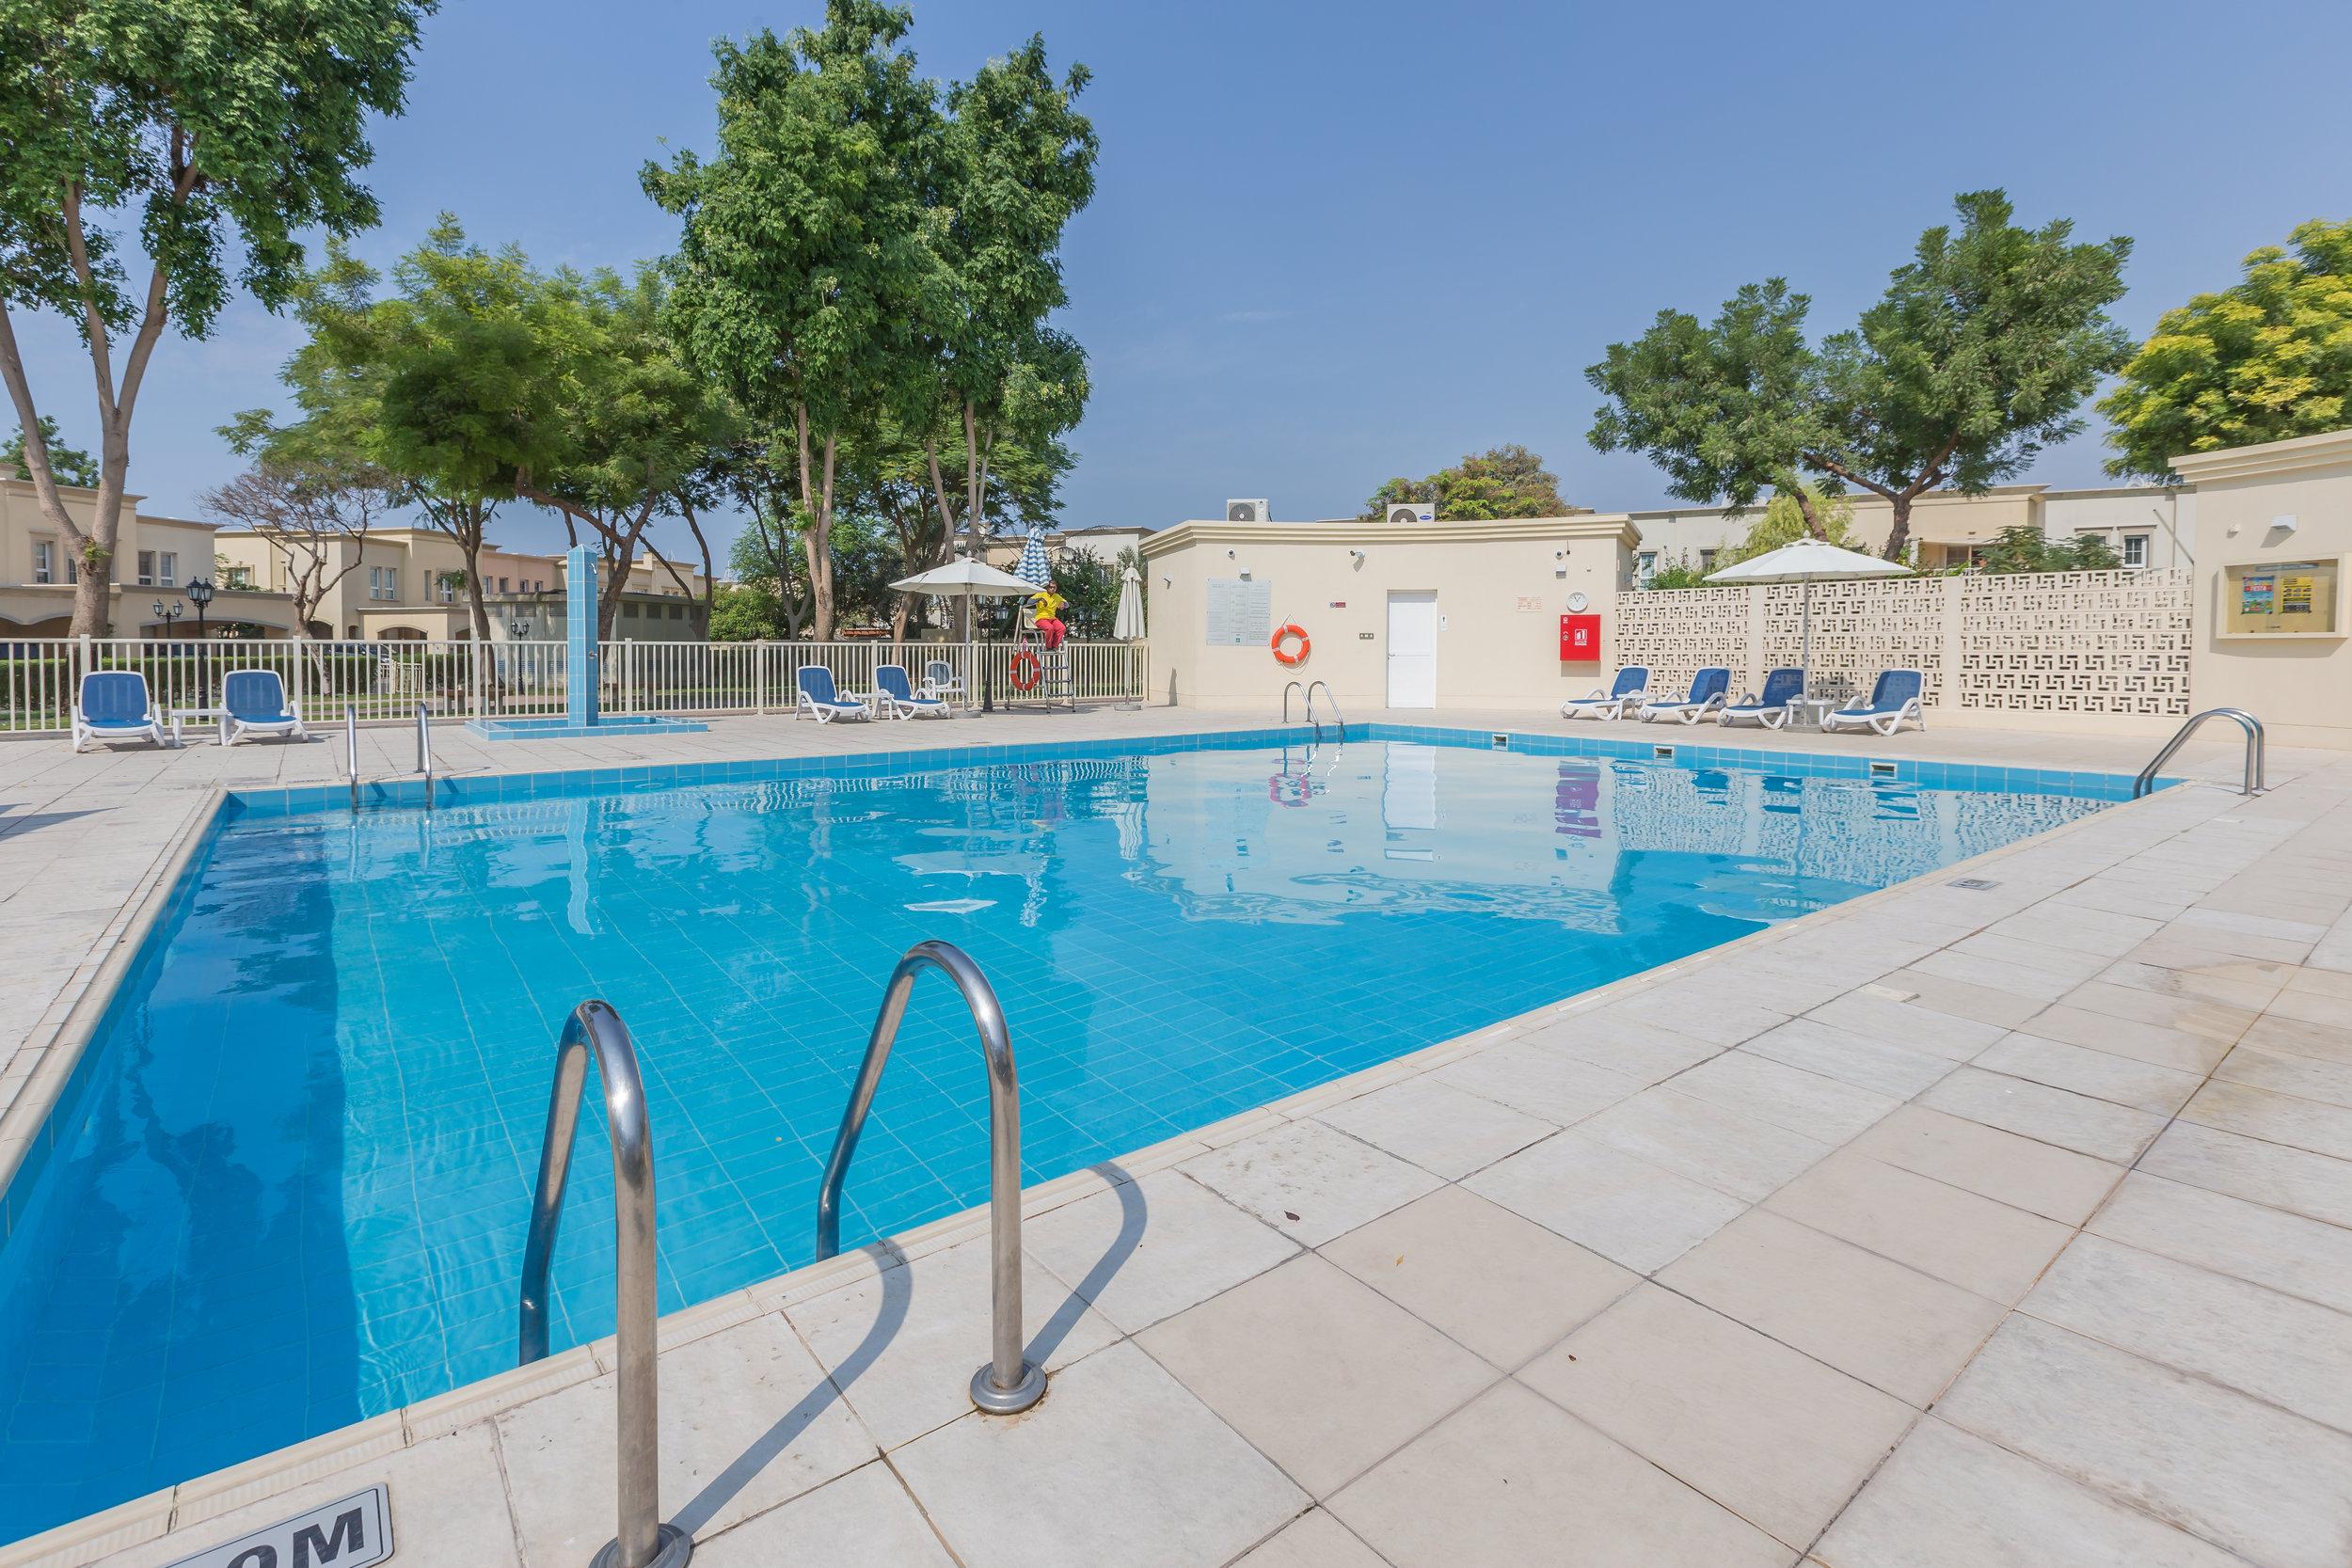 Swimming pool a.jpg